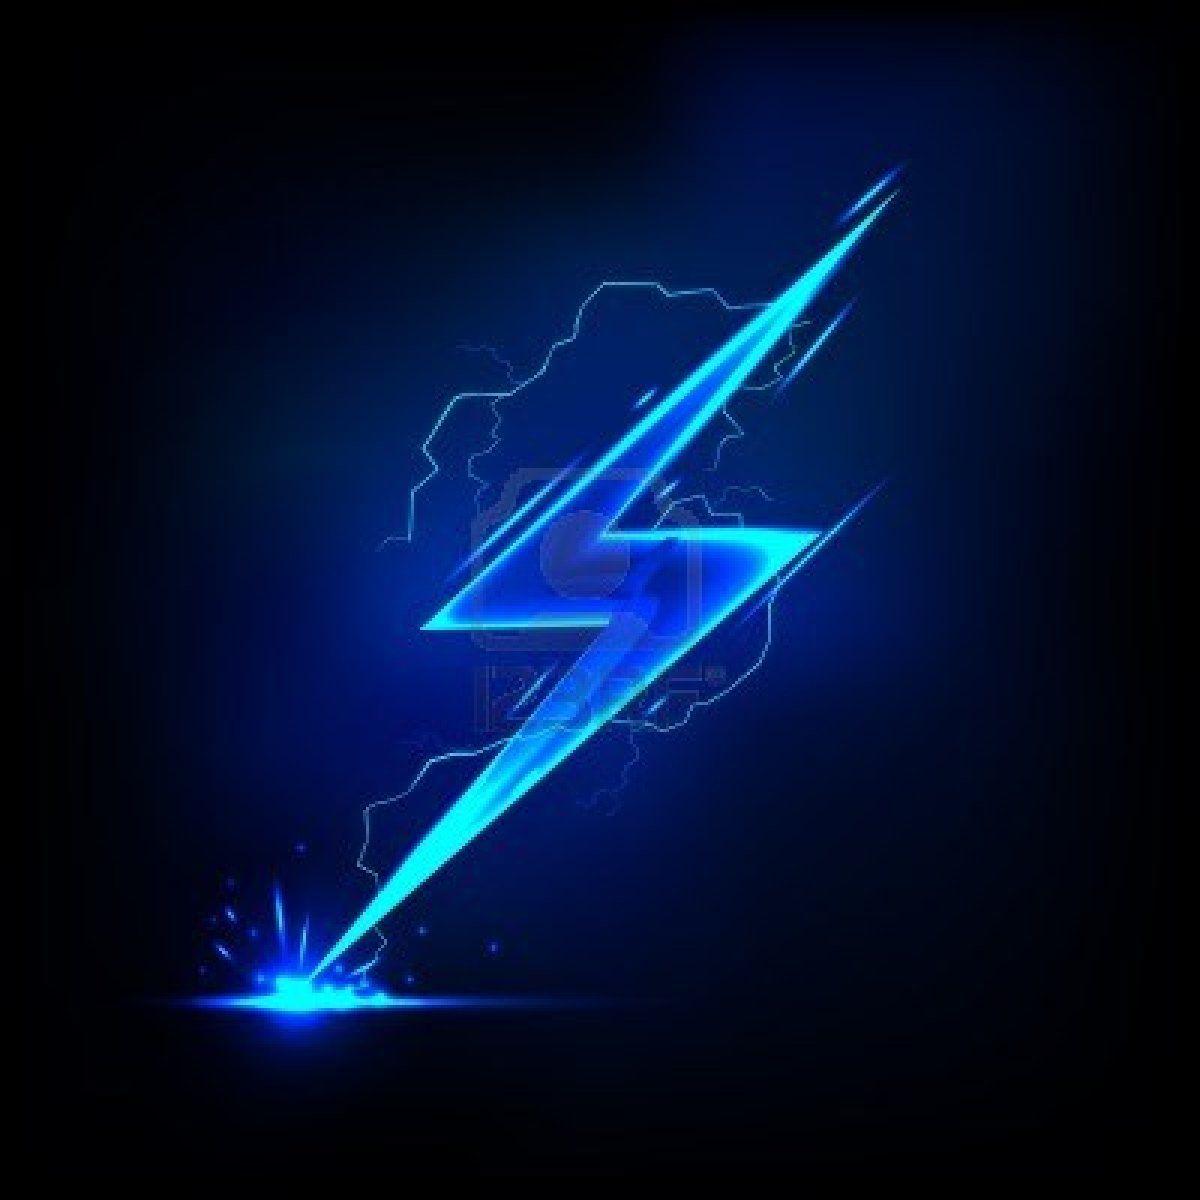 Electric lightning bolt | BOLT (Middle School Sunday ...